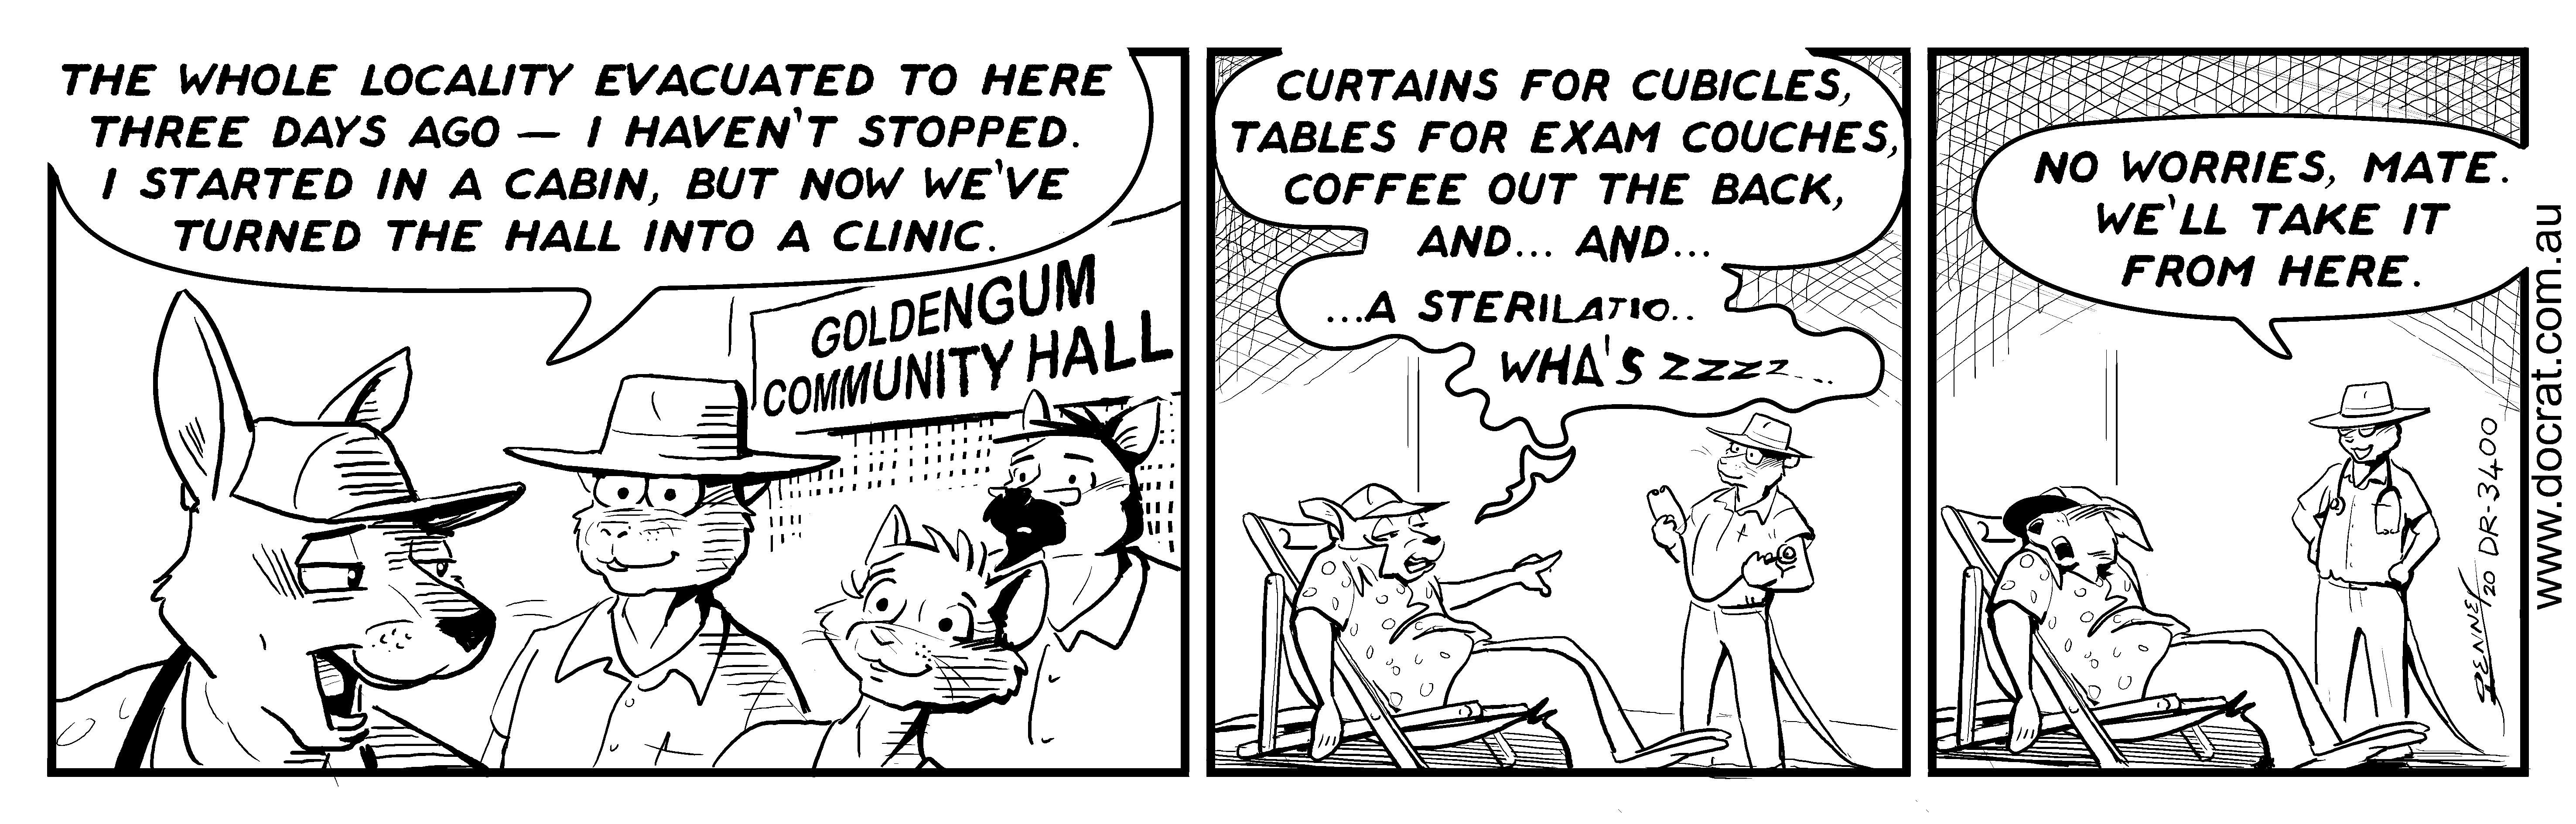 20200124